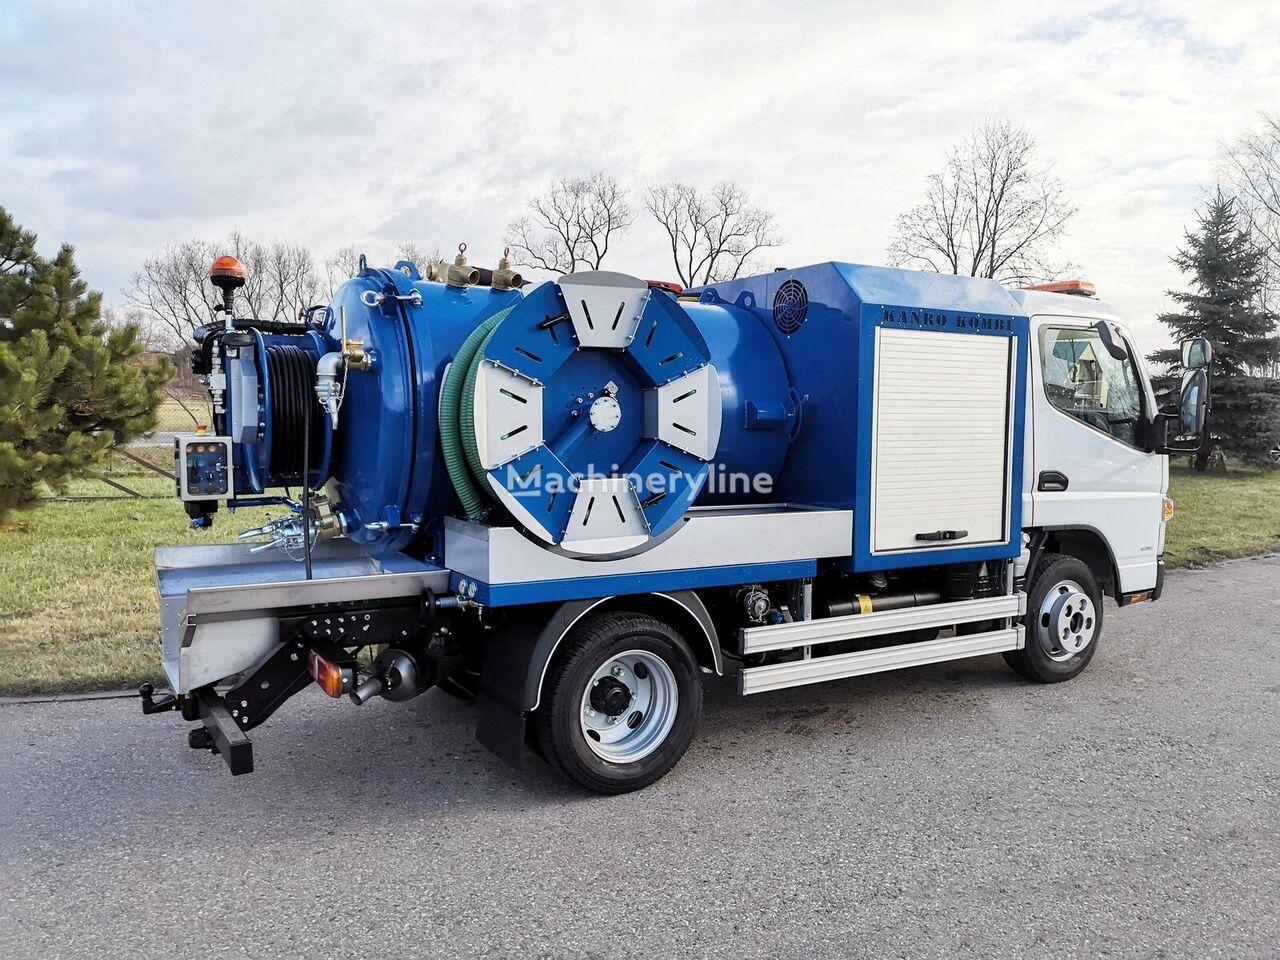 new MITSUBISHI Fuso Canter / Combi 1500 KanRo sewer jetter truck